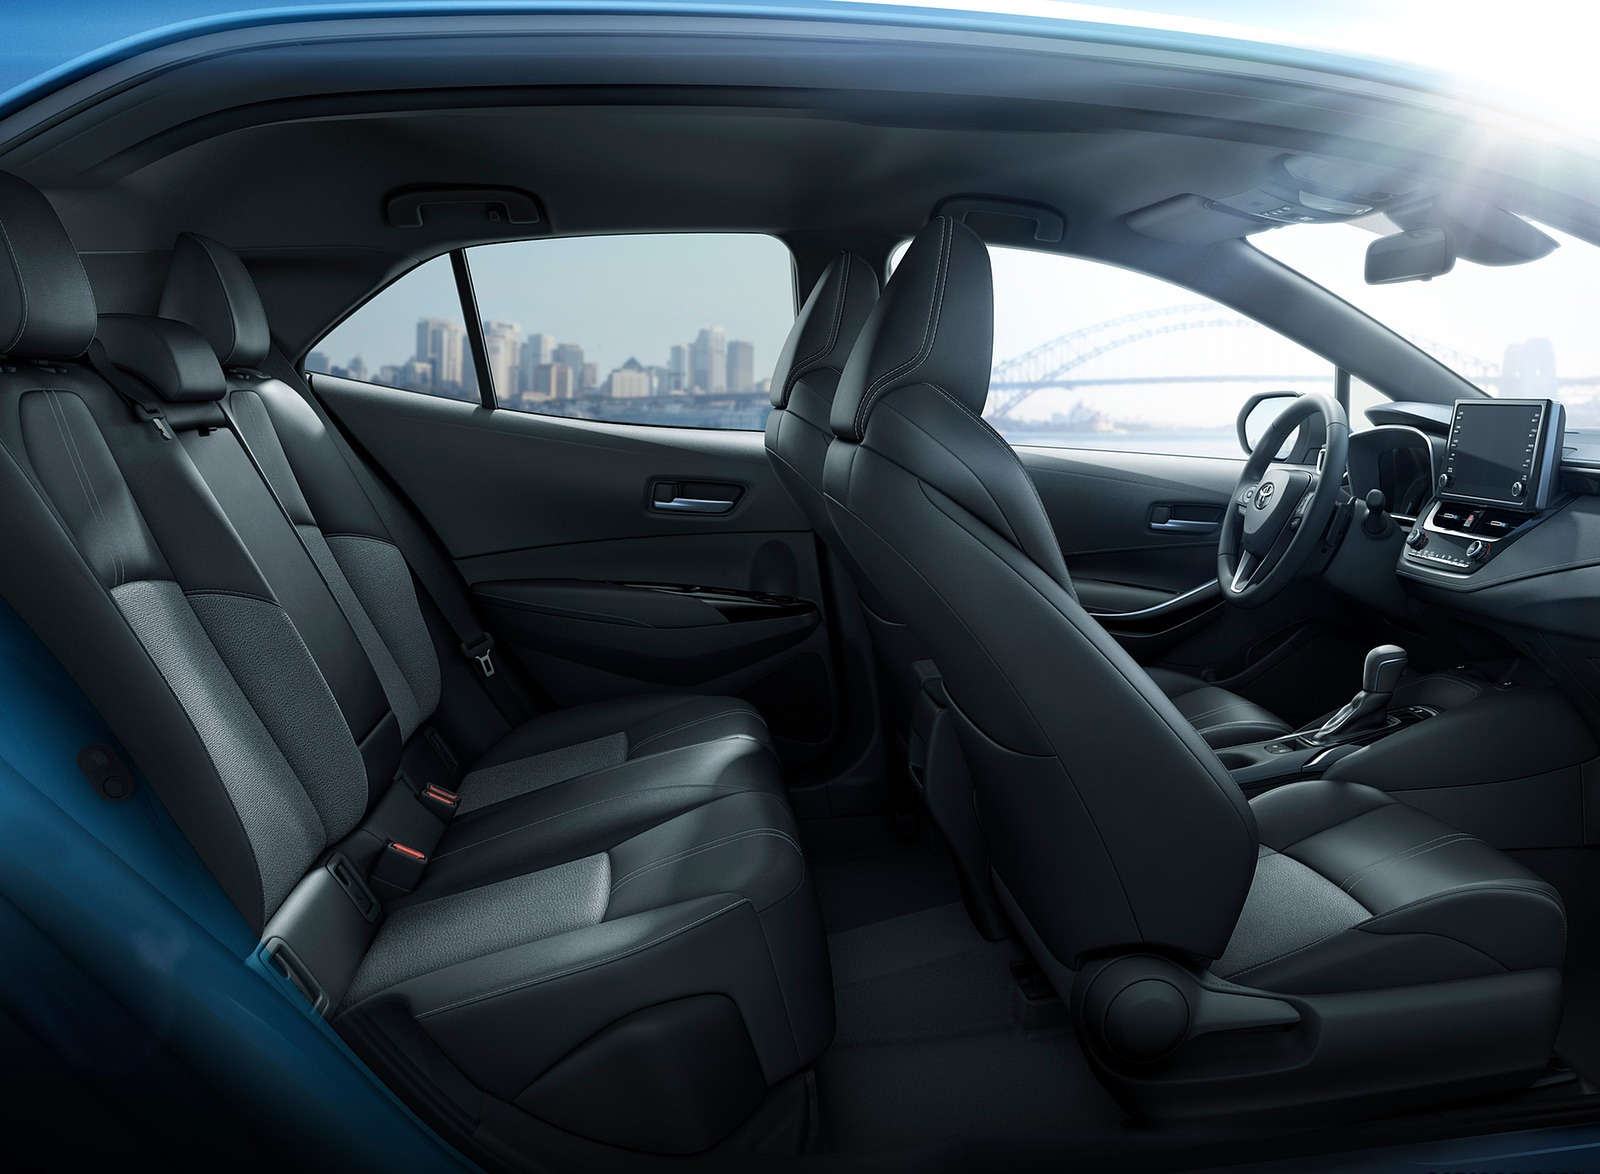 2019 Toyota Corolla Hatchback Interior Seats Wallpaper (15)